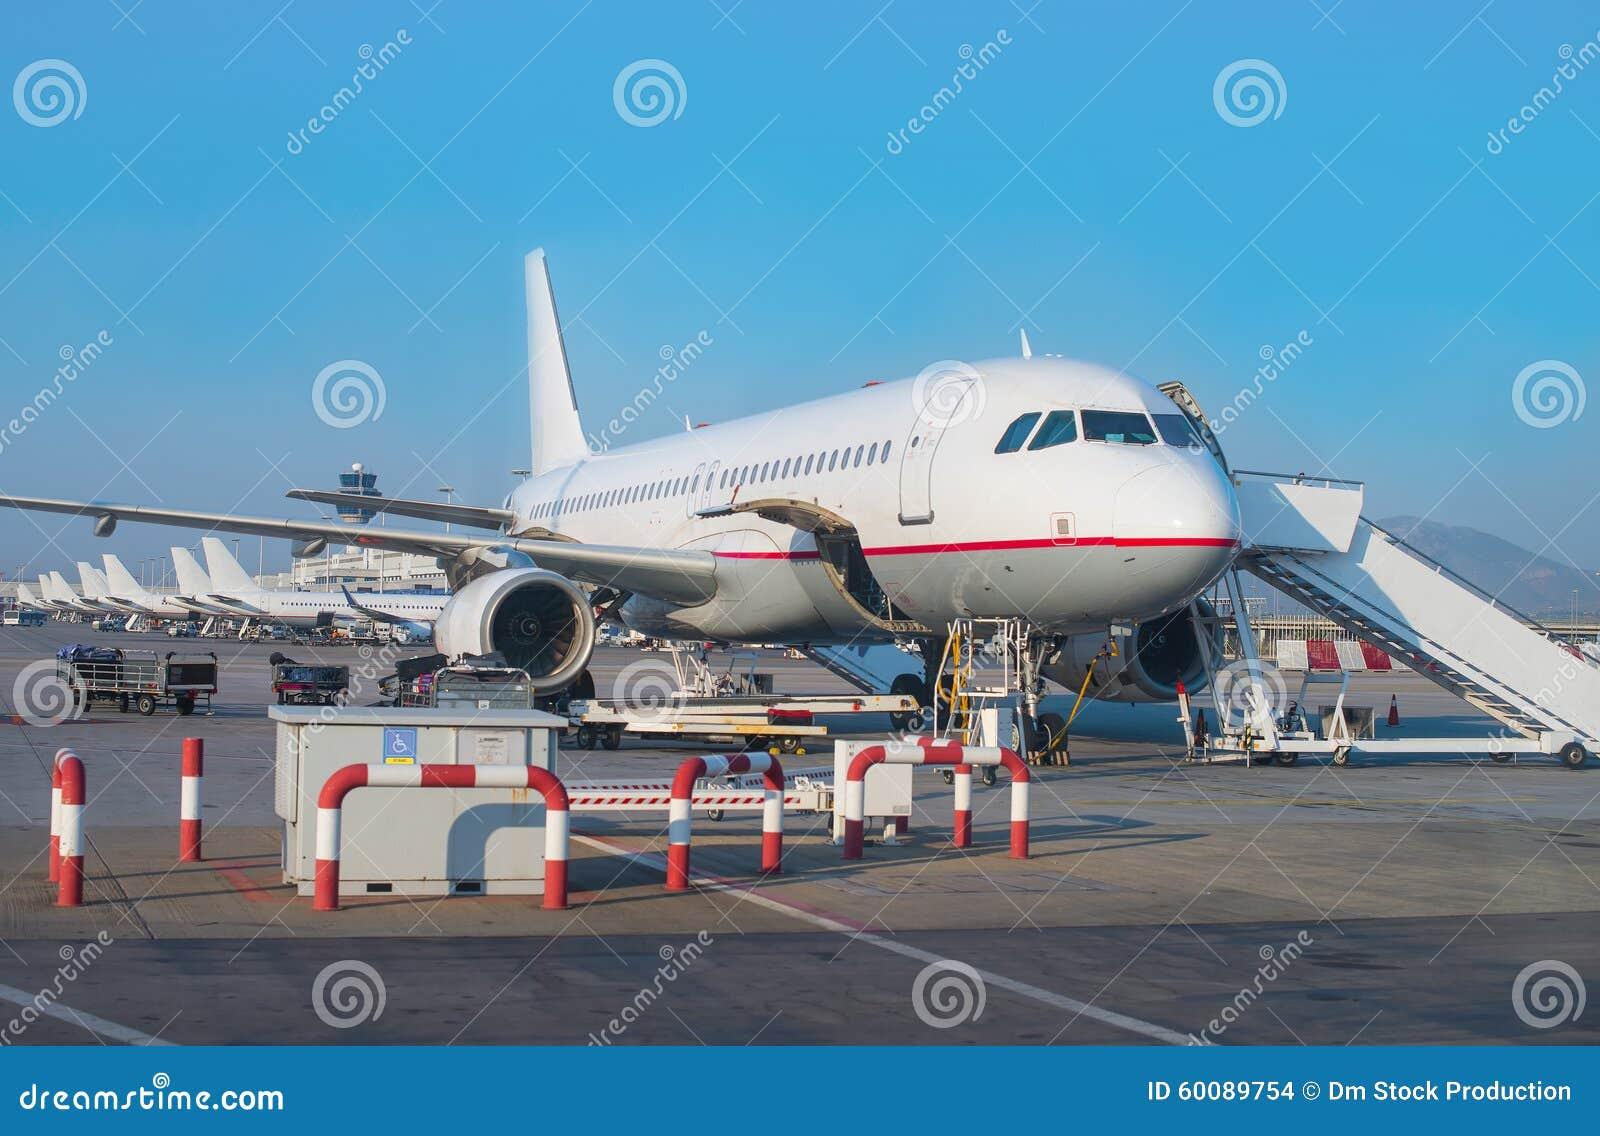 aircraft airline essay maintenance modernization